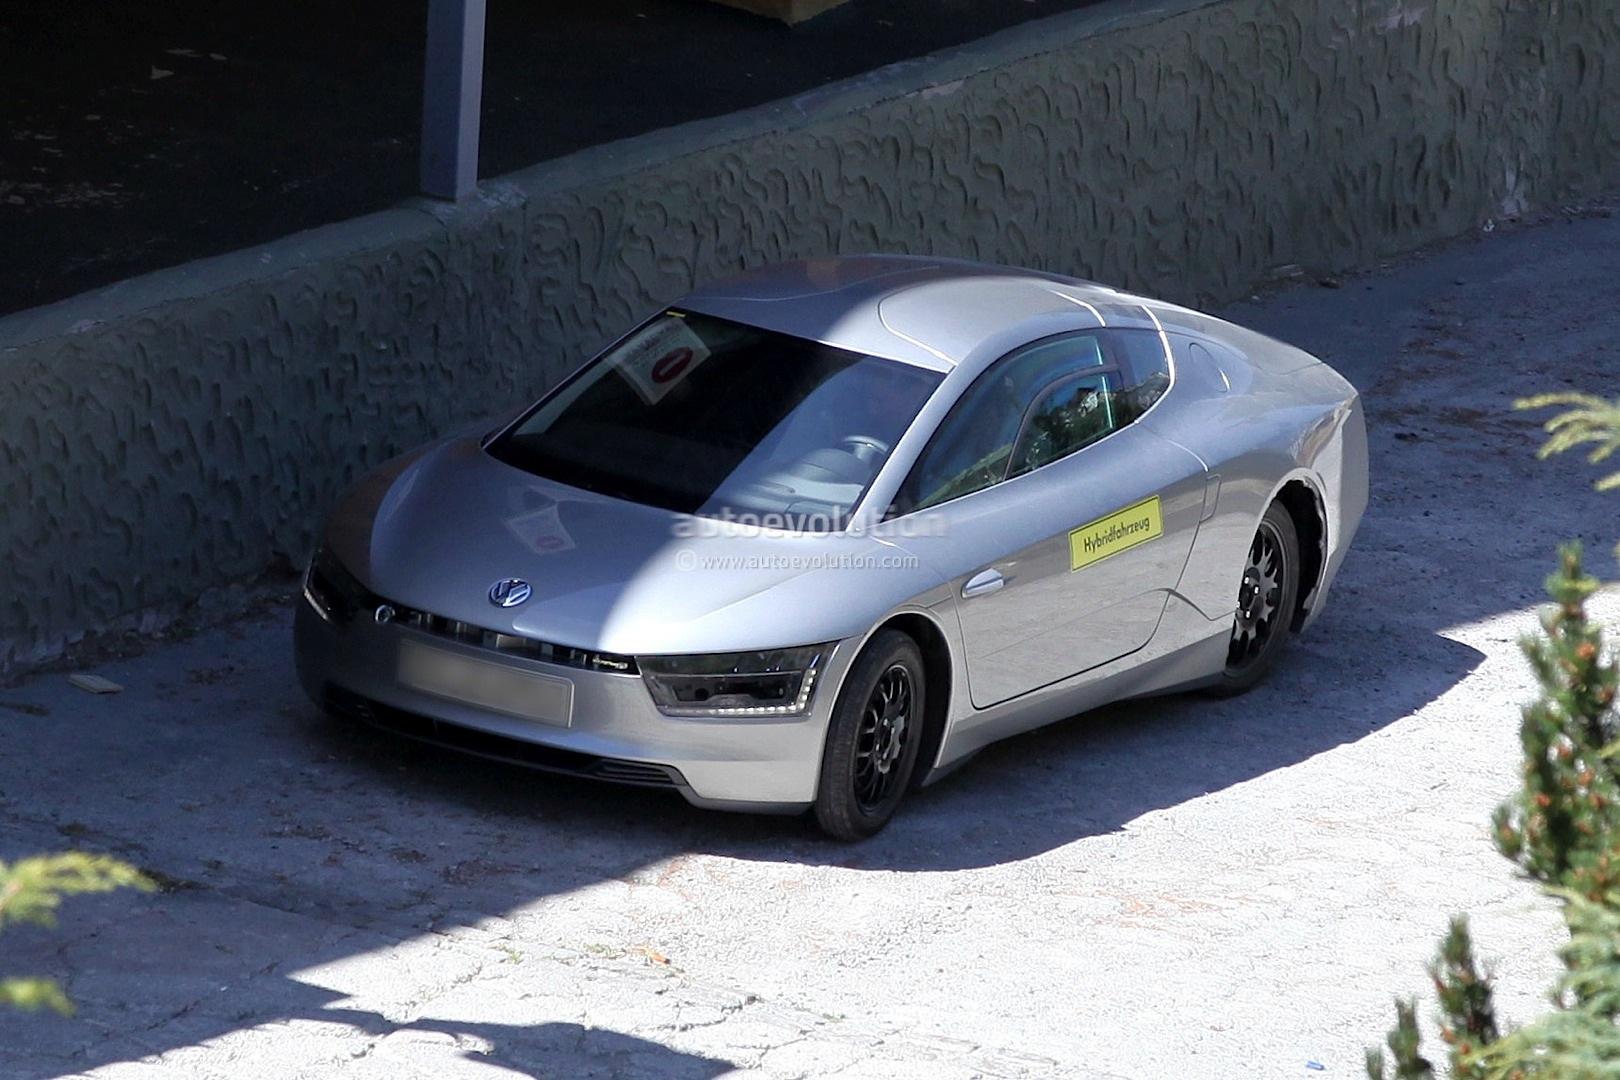 spyshots 2014 volkswagen xl1 autoevolution. Black Bedroom Furniture Sets. Home Design Ideas